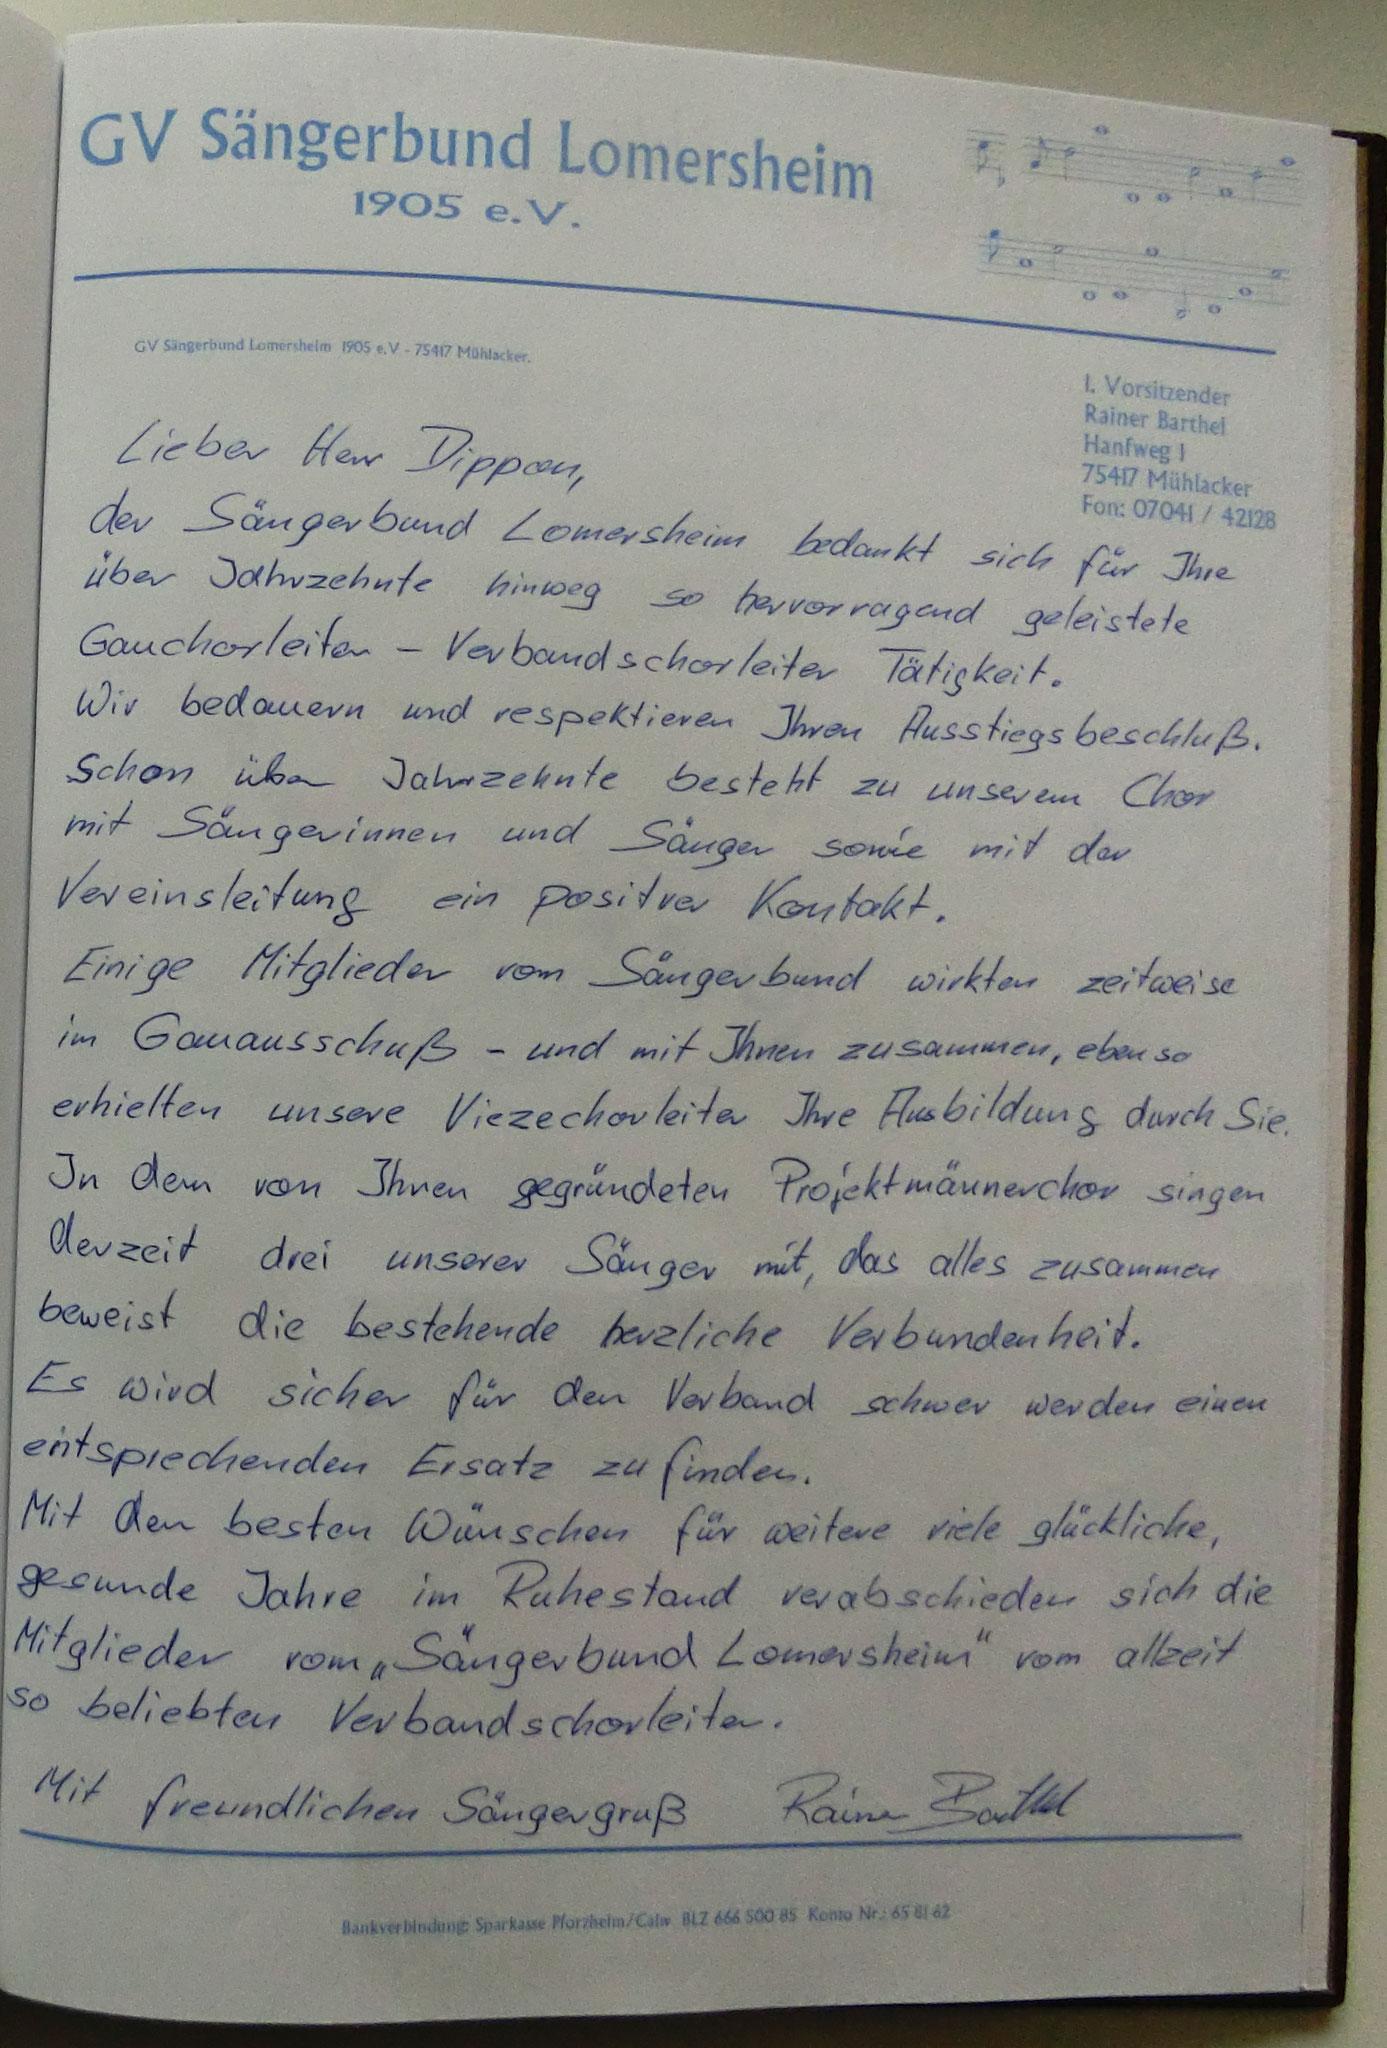 Sängerbund Lomersheim